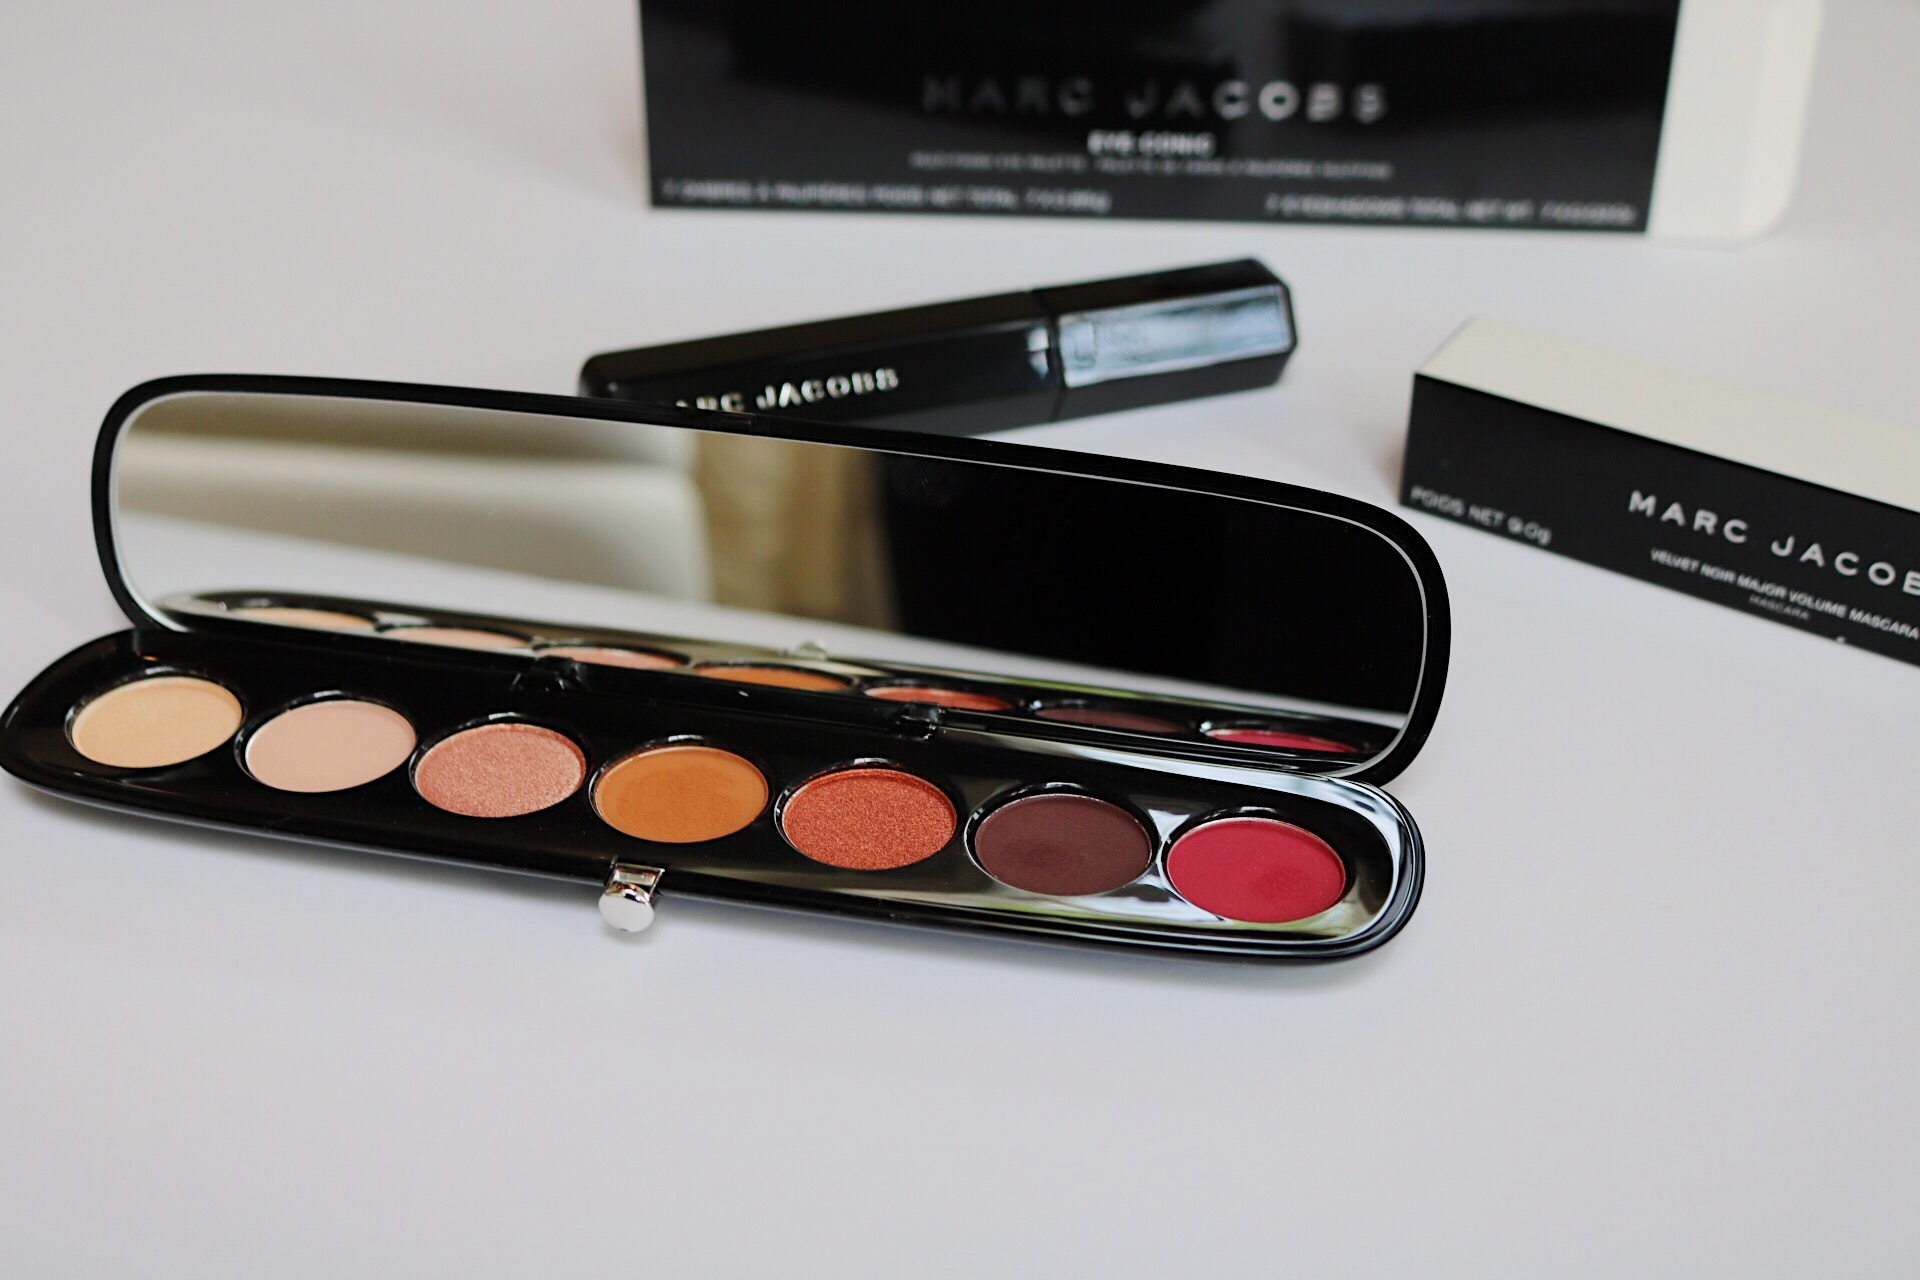 Marc Jacobs Beauty Eye-Conic Palette